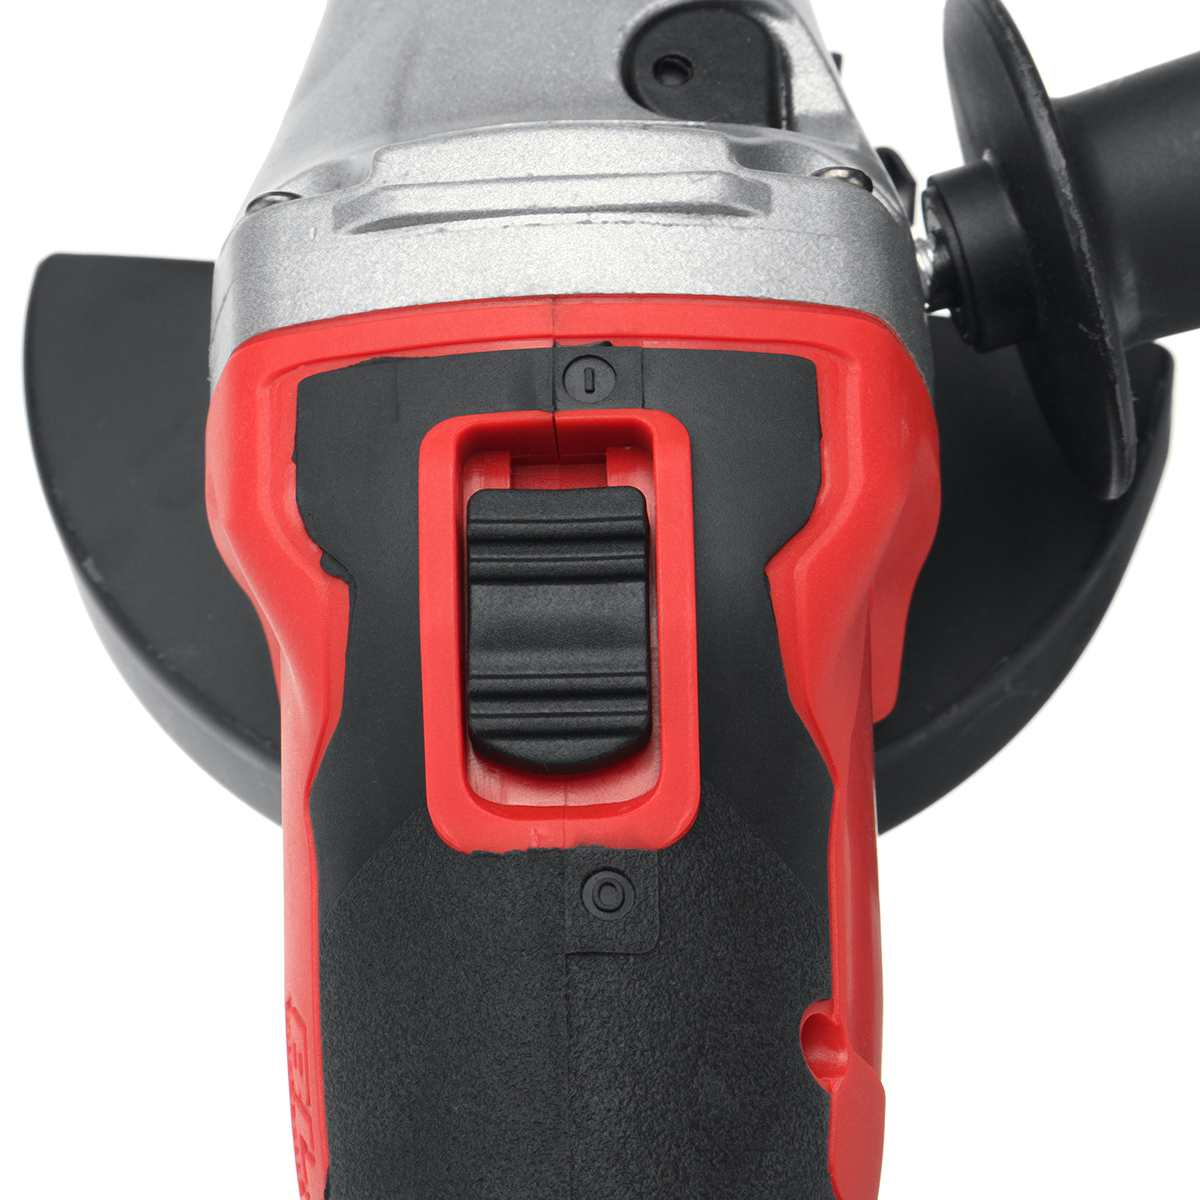 Brushless máquina moedor de ângulo elétrico 125mm